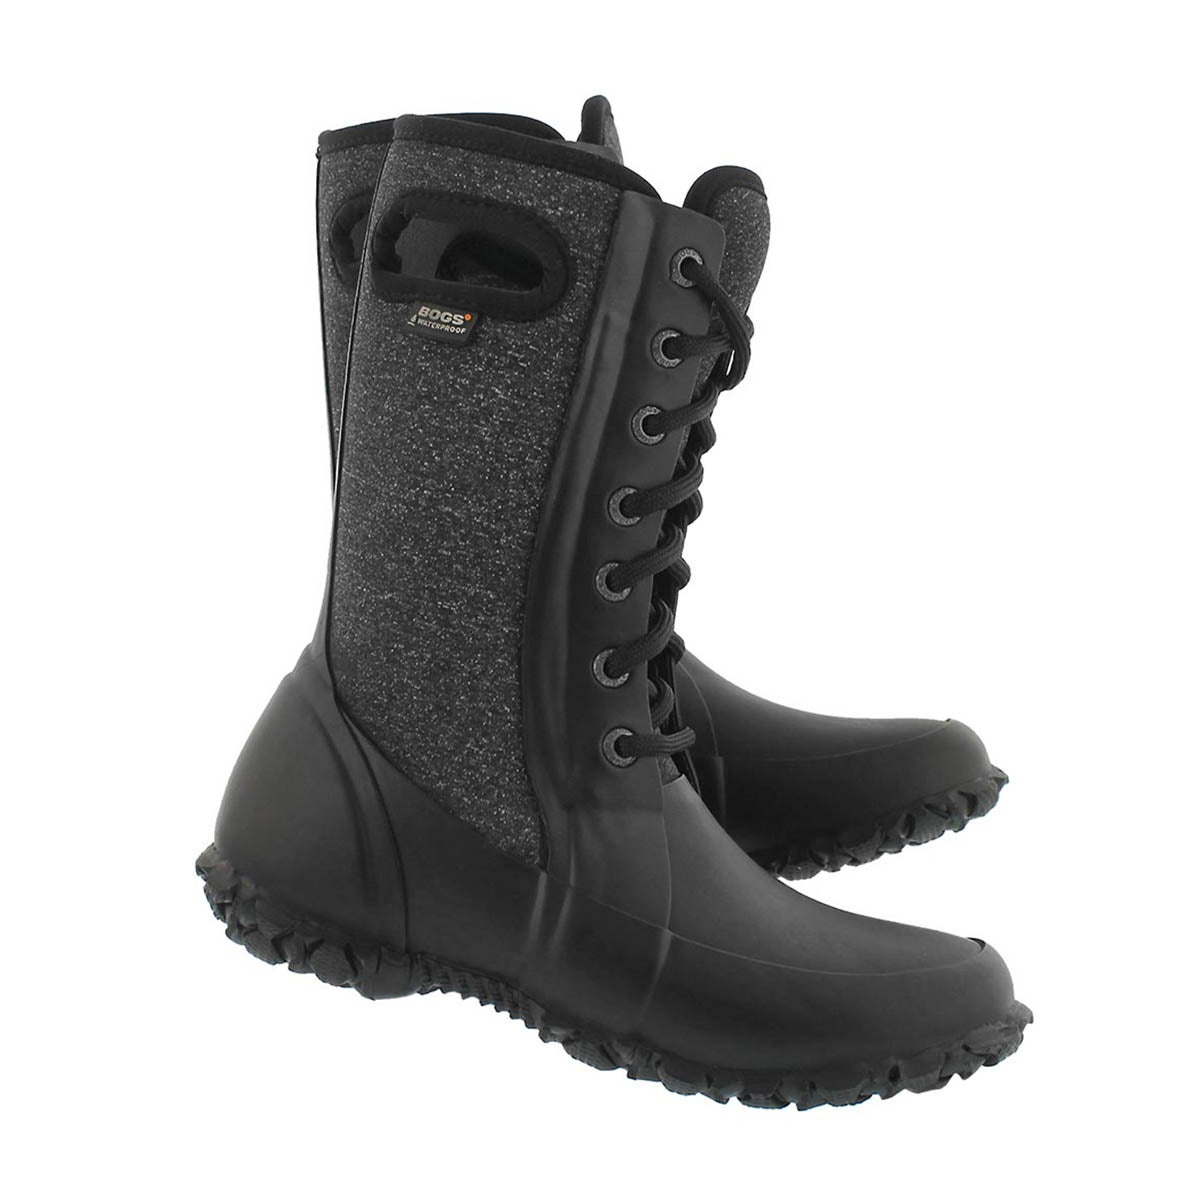 Grls Cami black wtpf lace up boot